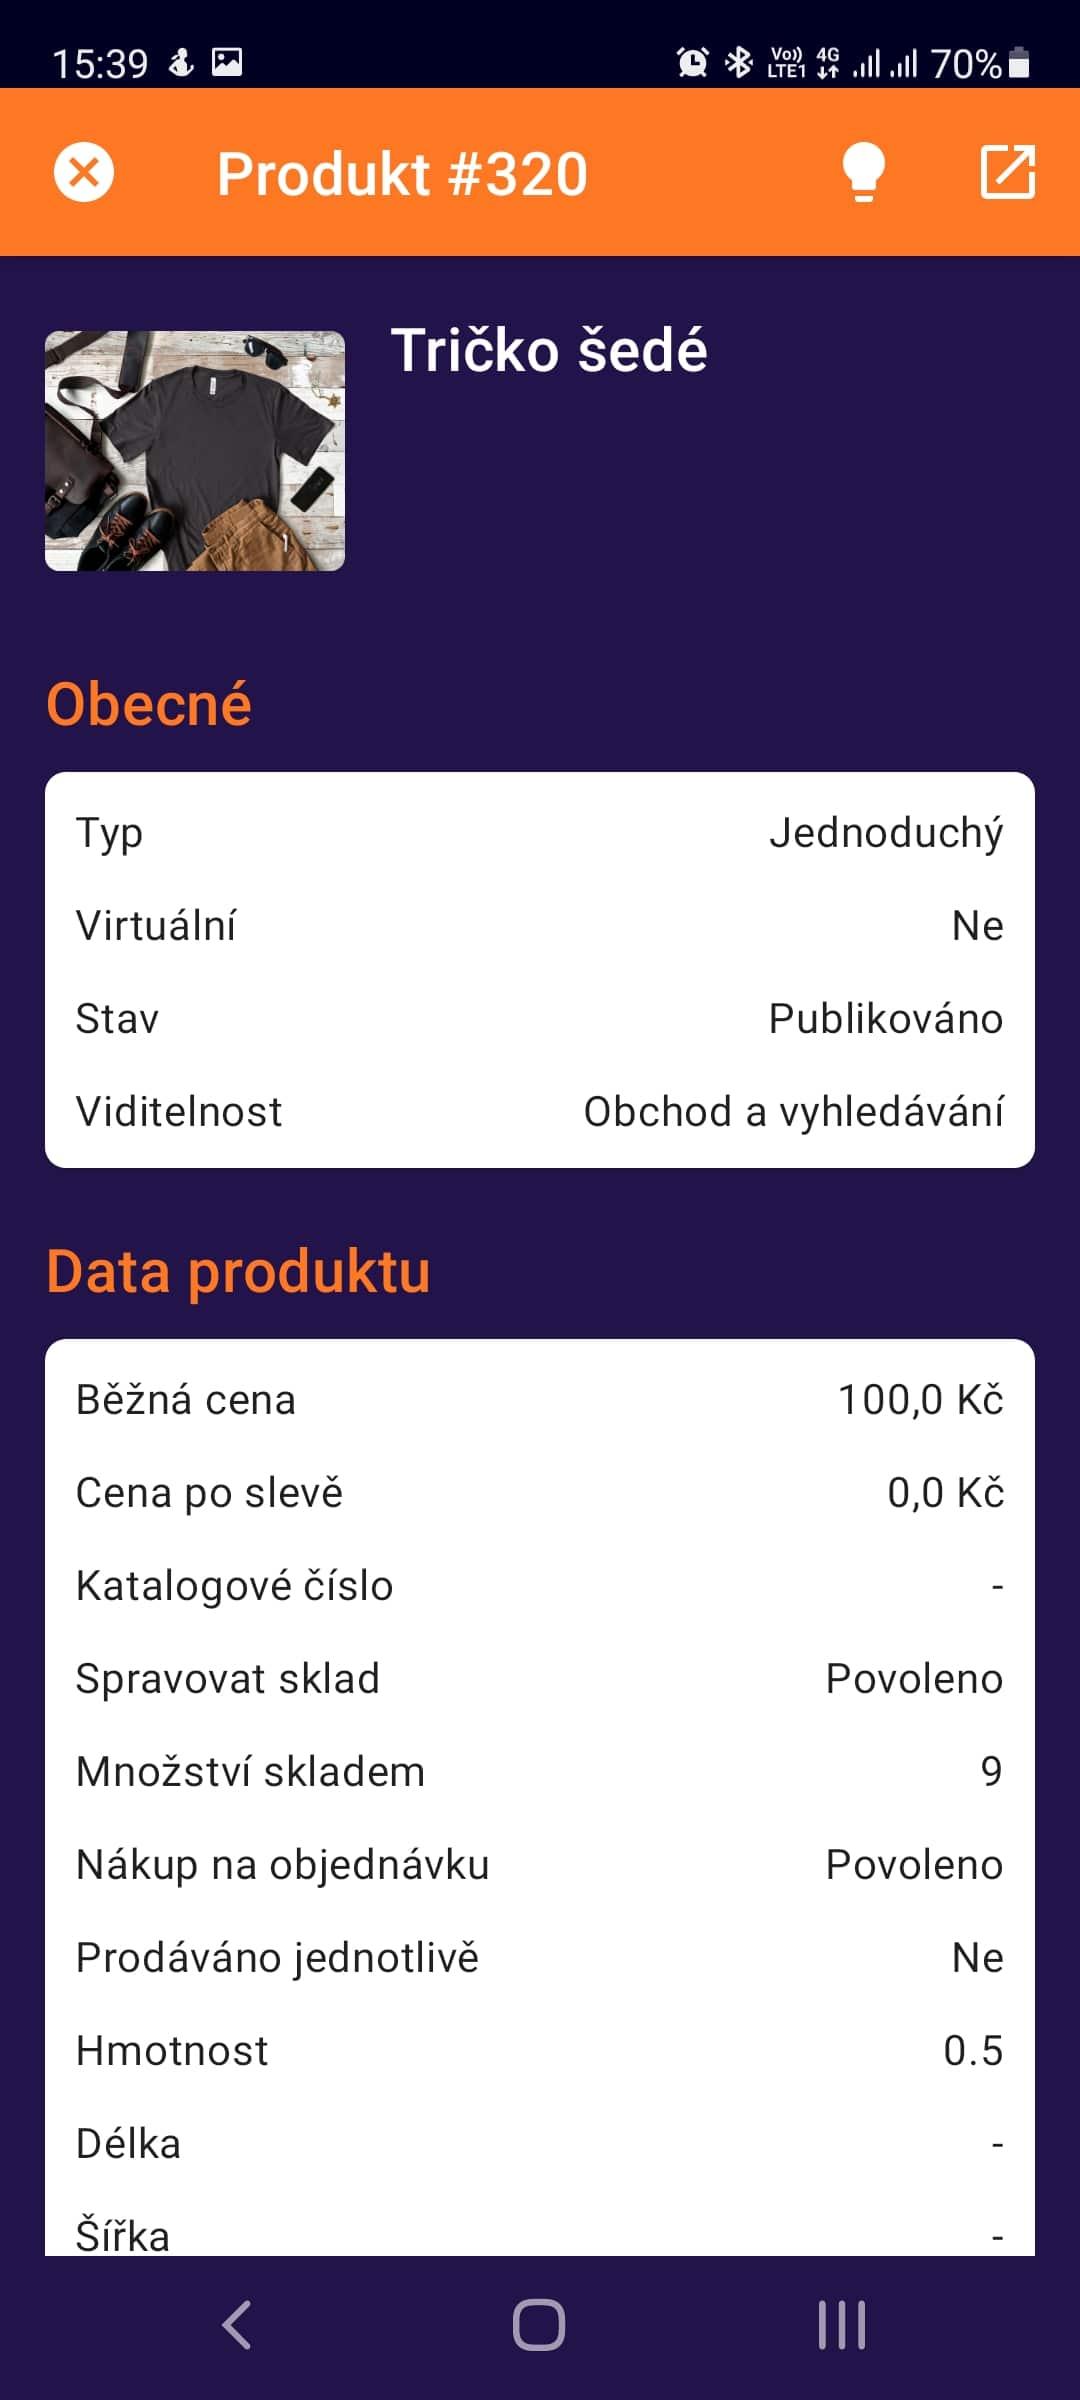 Toret WooCommerce Manager - detail produktu první část (Světlý režim)